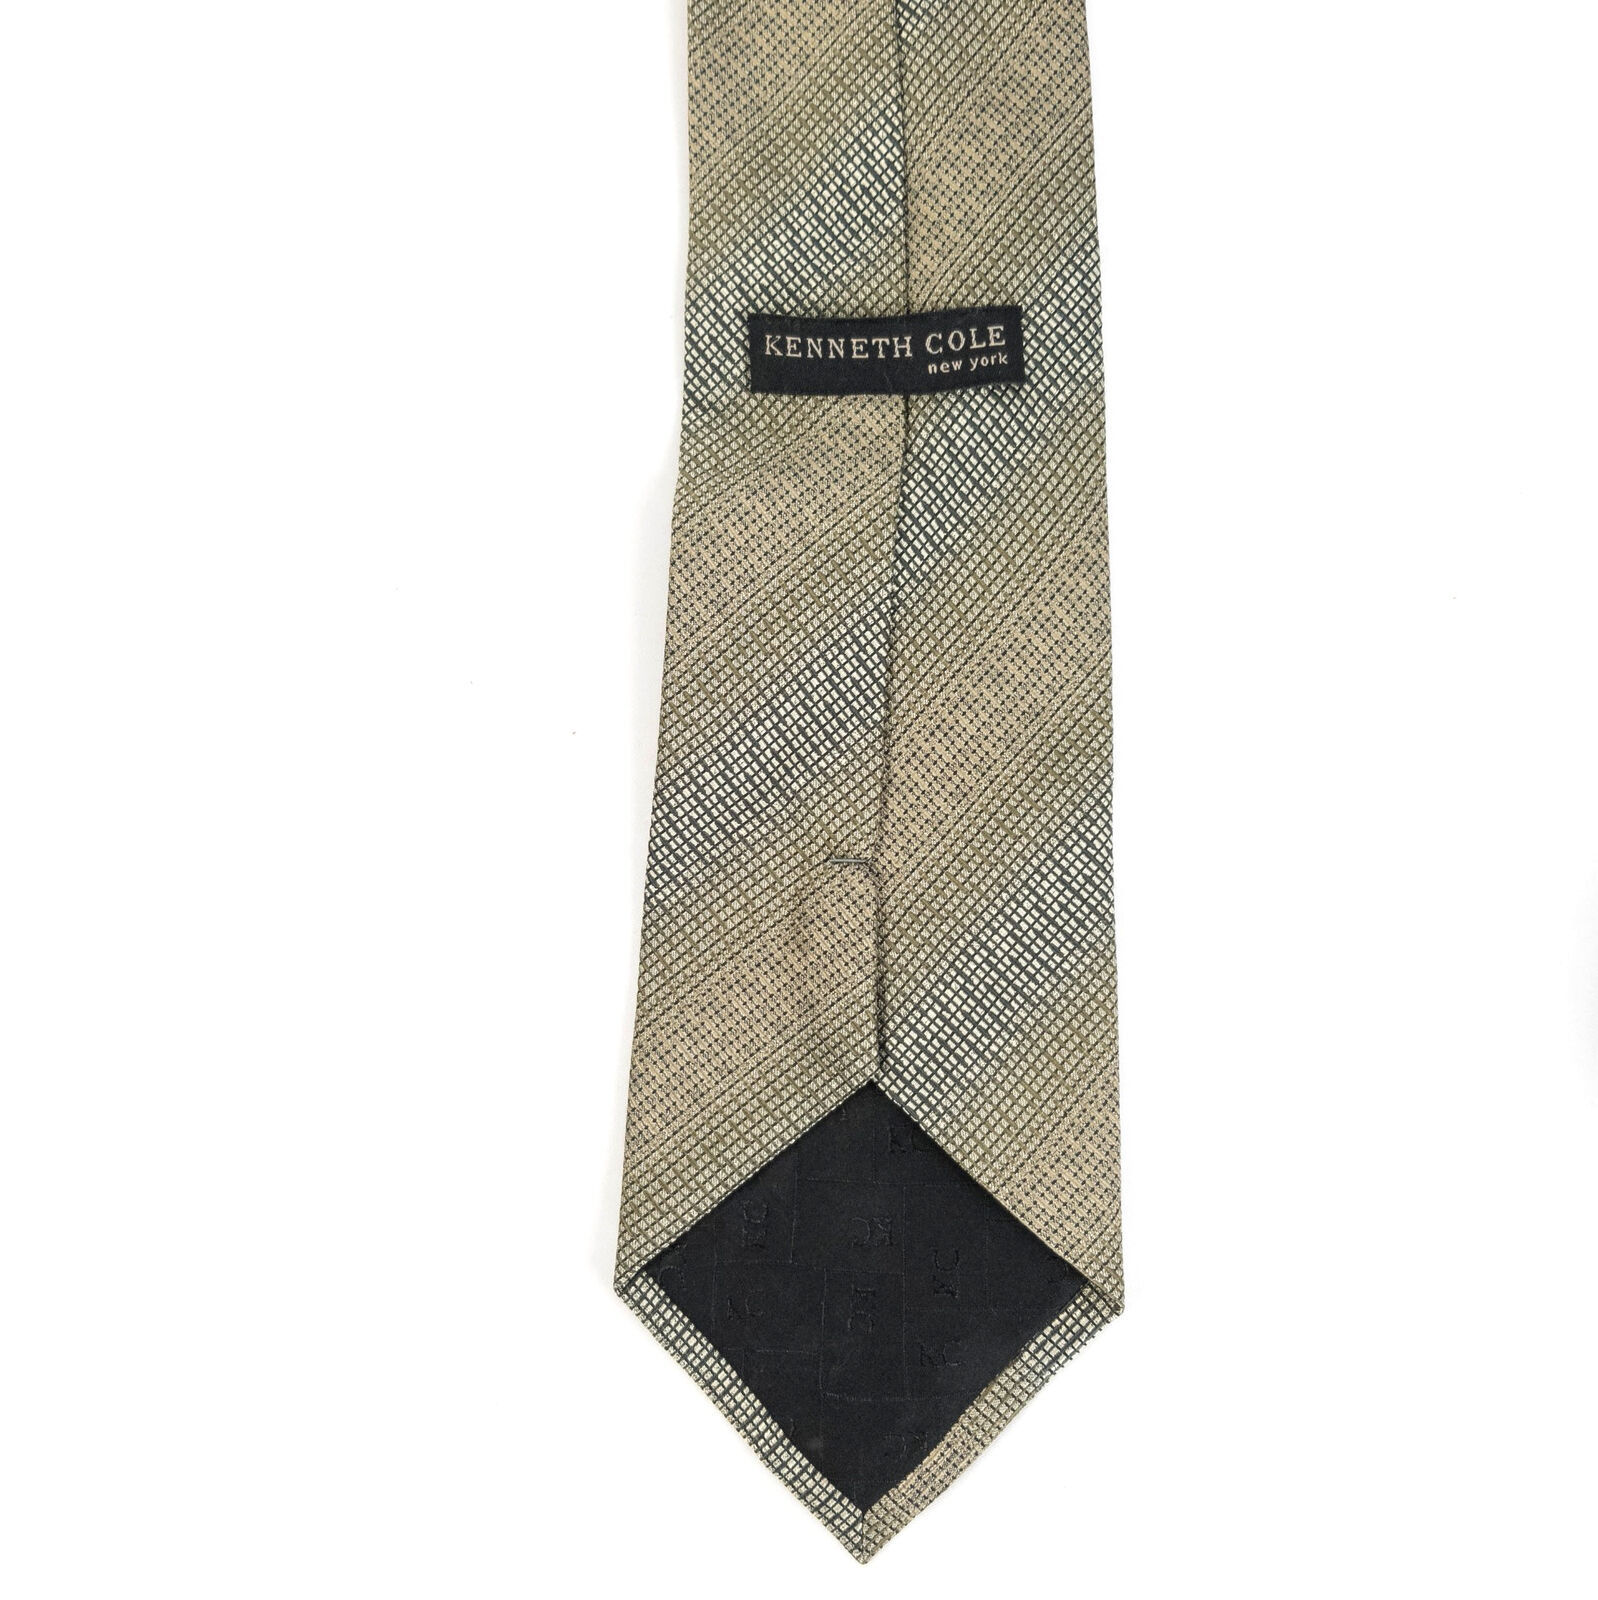 Kenneth Cole New York Green Geometric Silk Necktie Tie image 4